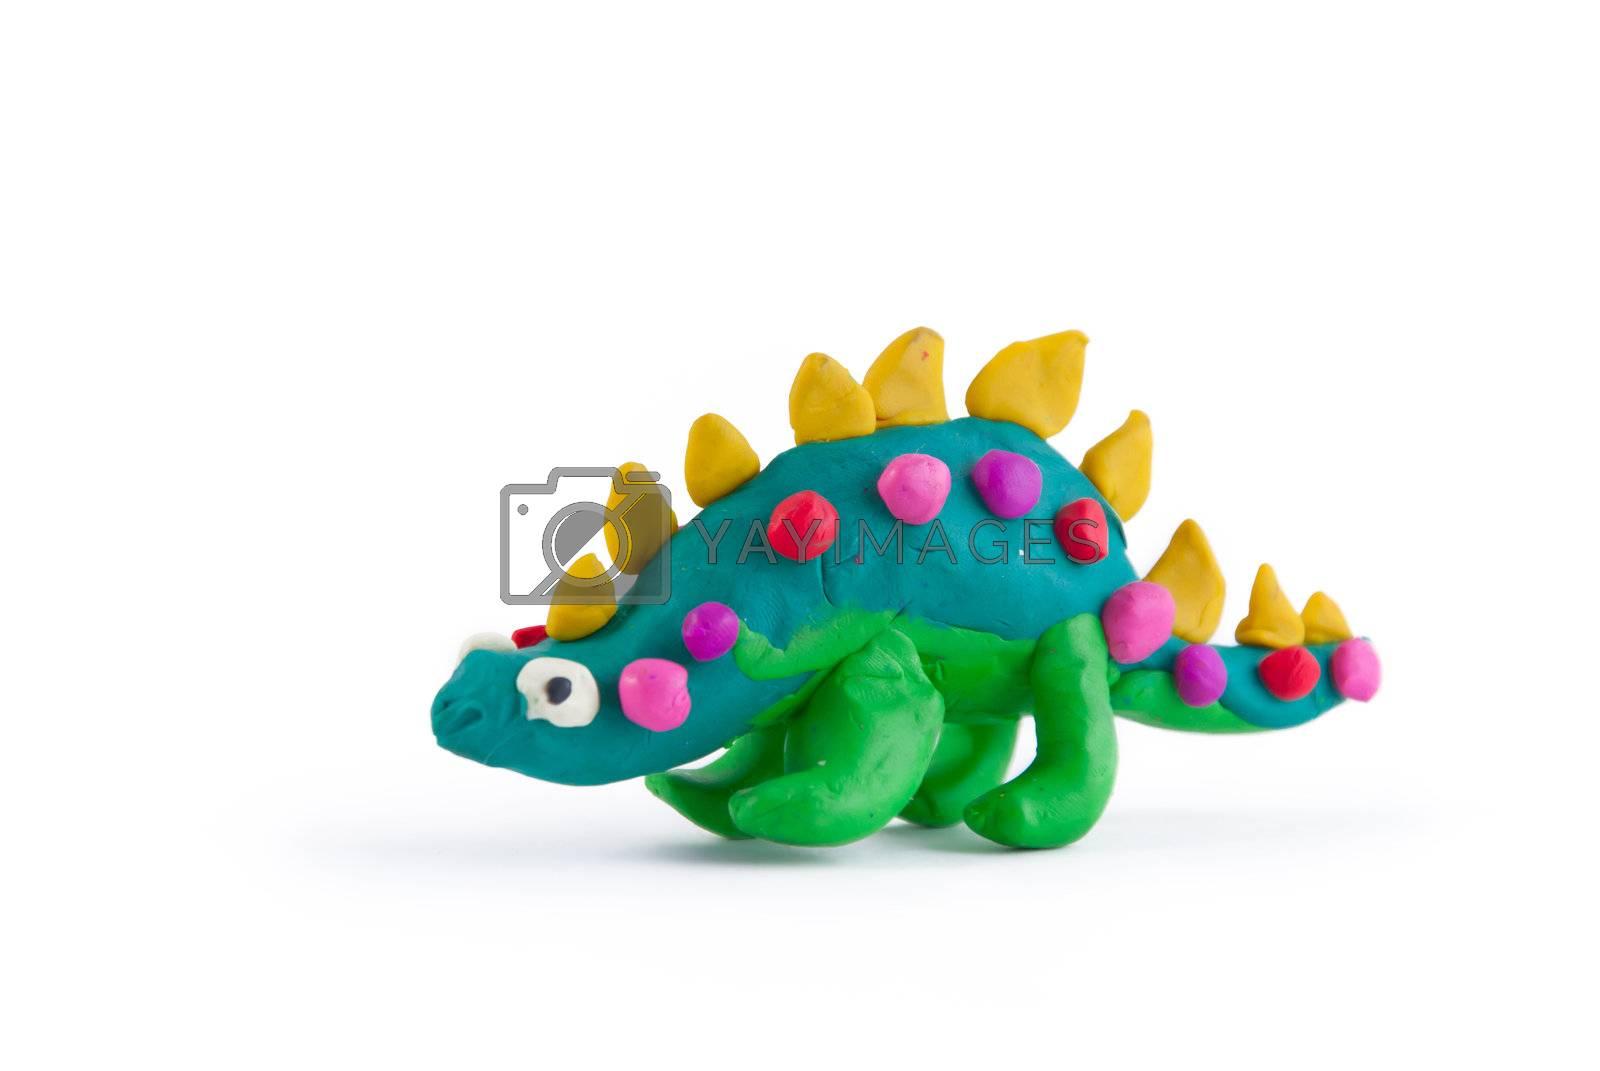 Dinosaur made of plasticine isolated on white